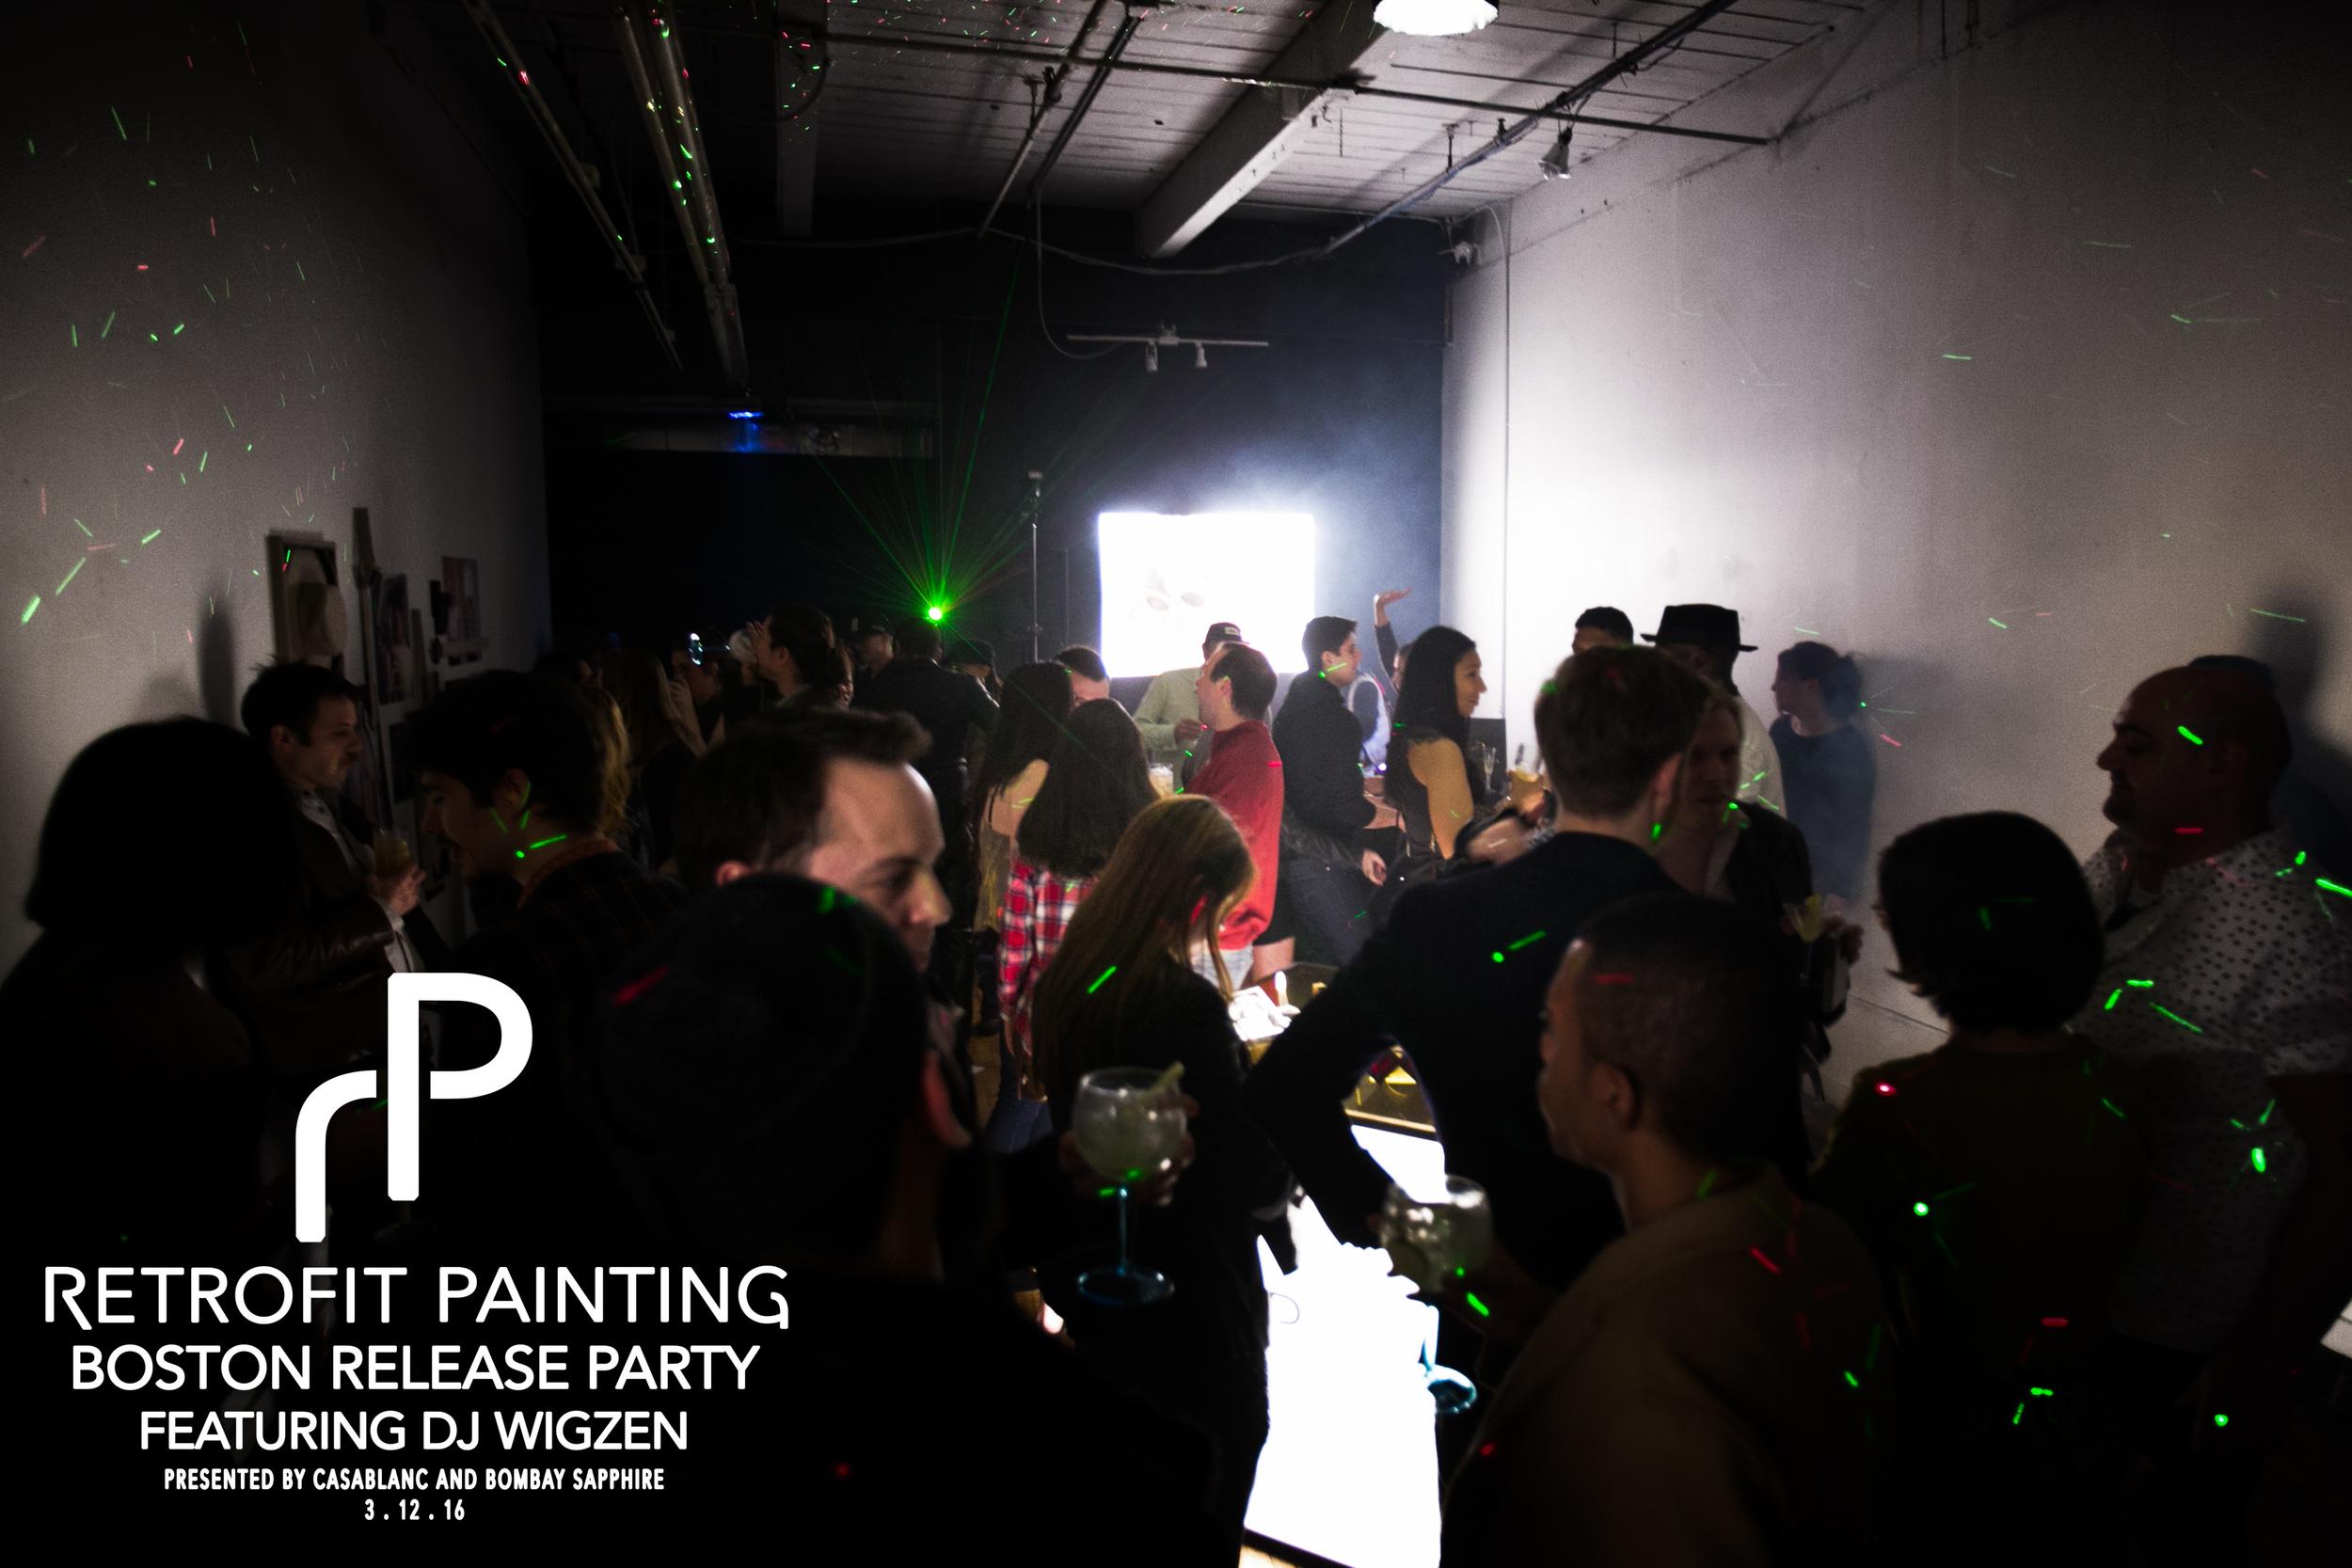 Retrofit Painting Boston Release Party 0175.jpg